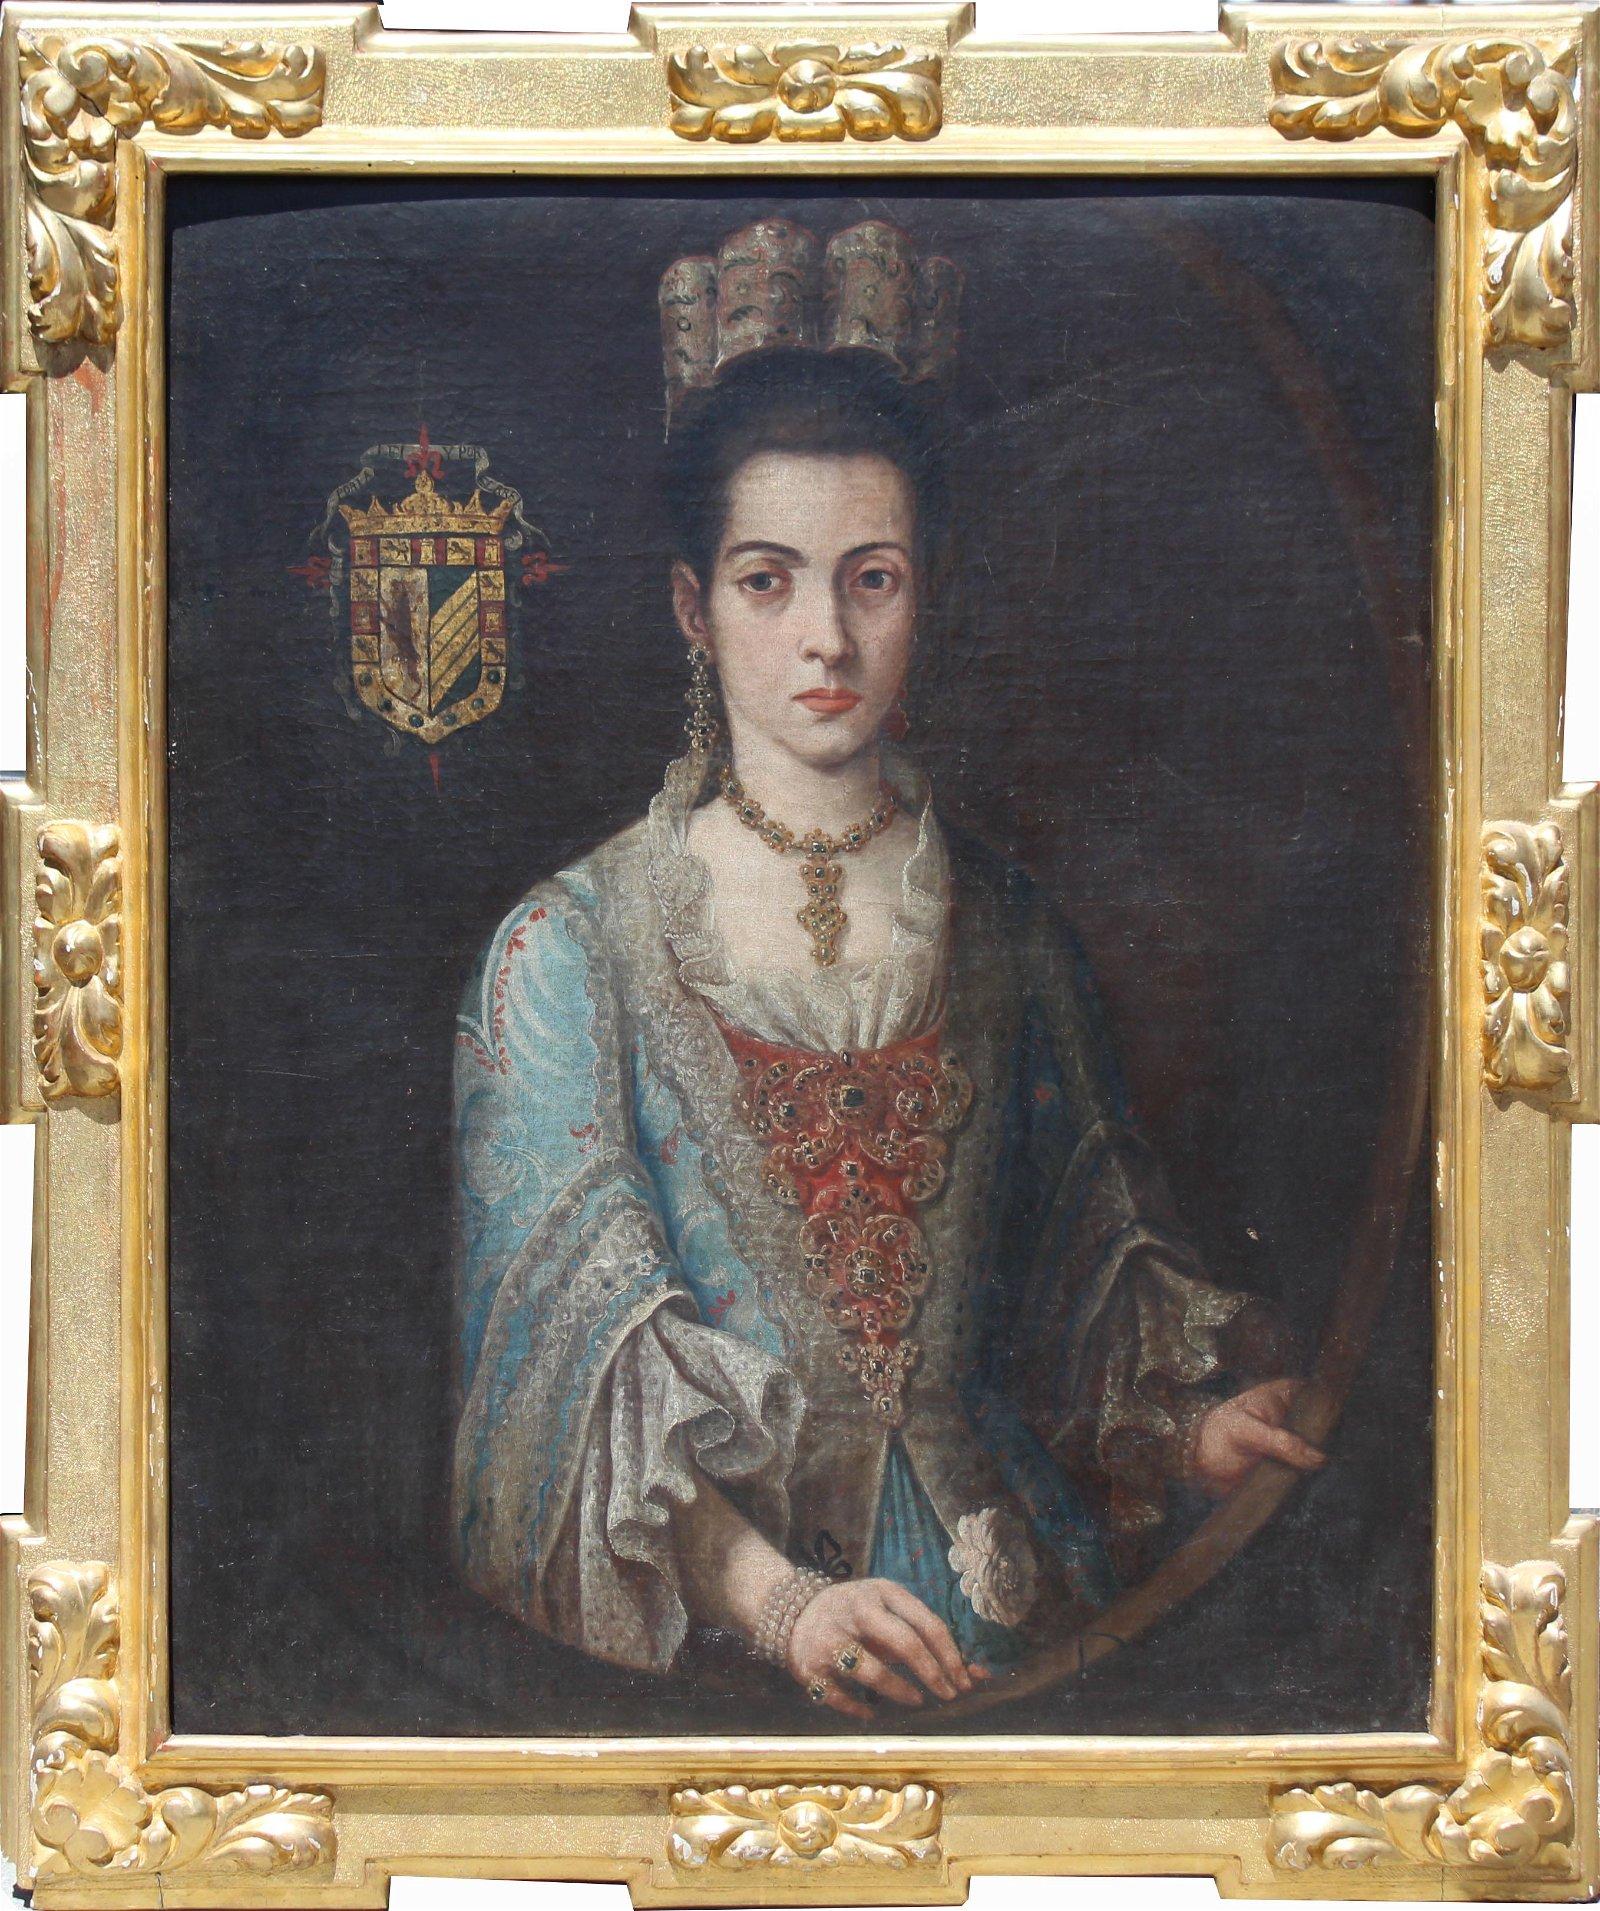 17th C Spanish School Portrait of an Elegant Woman